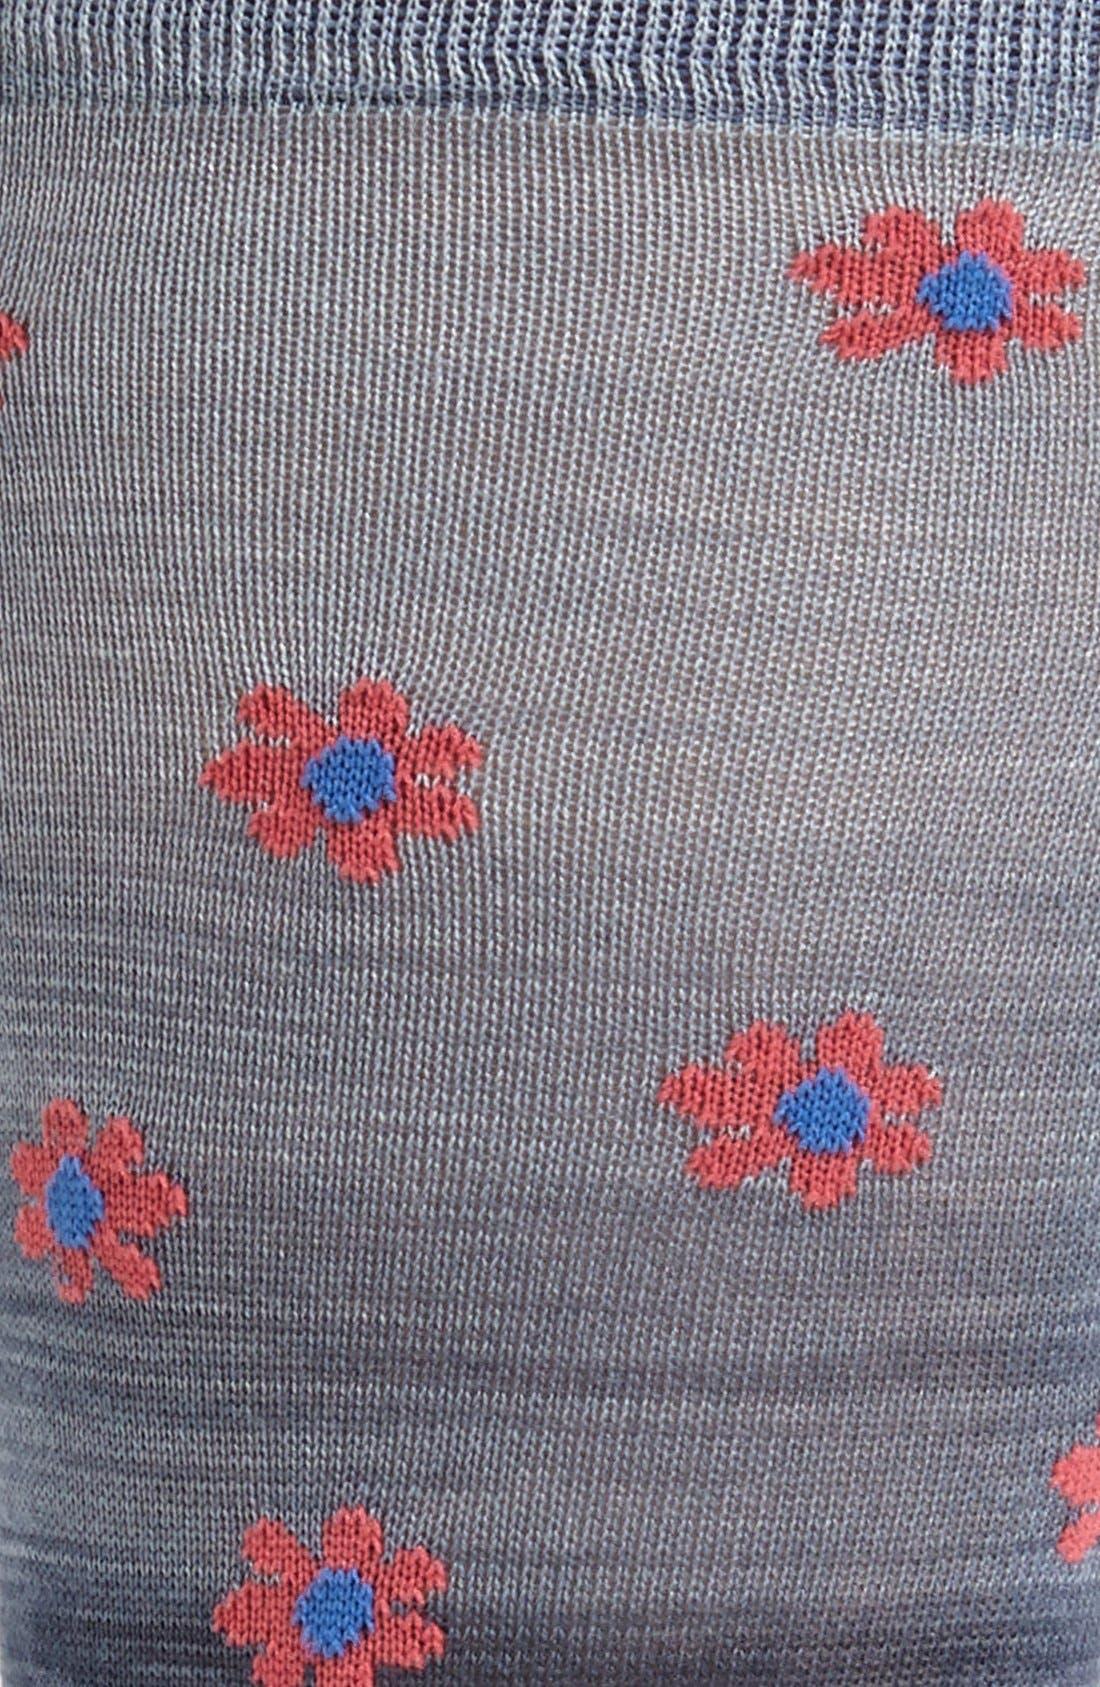 Alternate Image 2  - Marcoliani 'Delave' Floral Socks